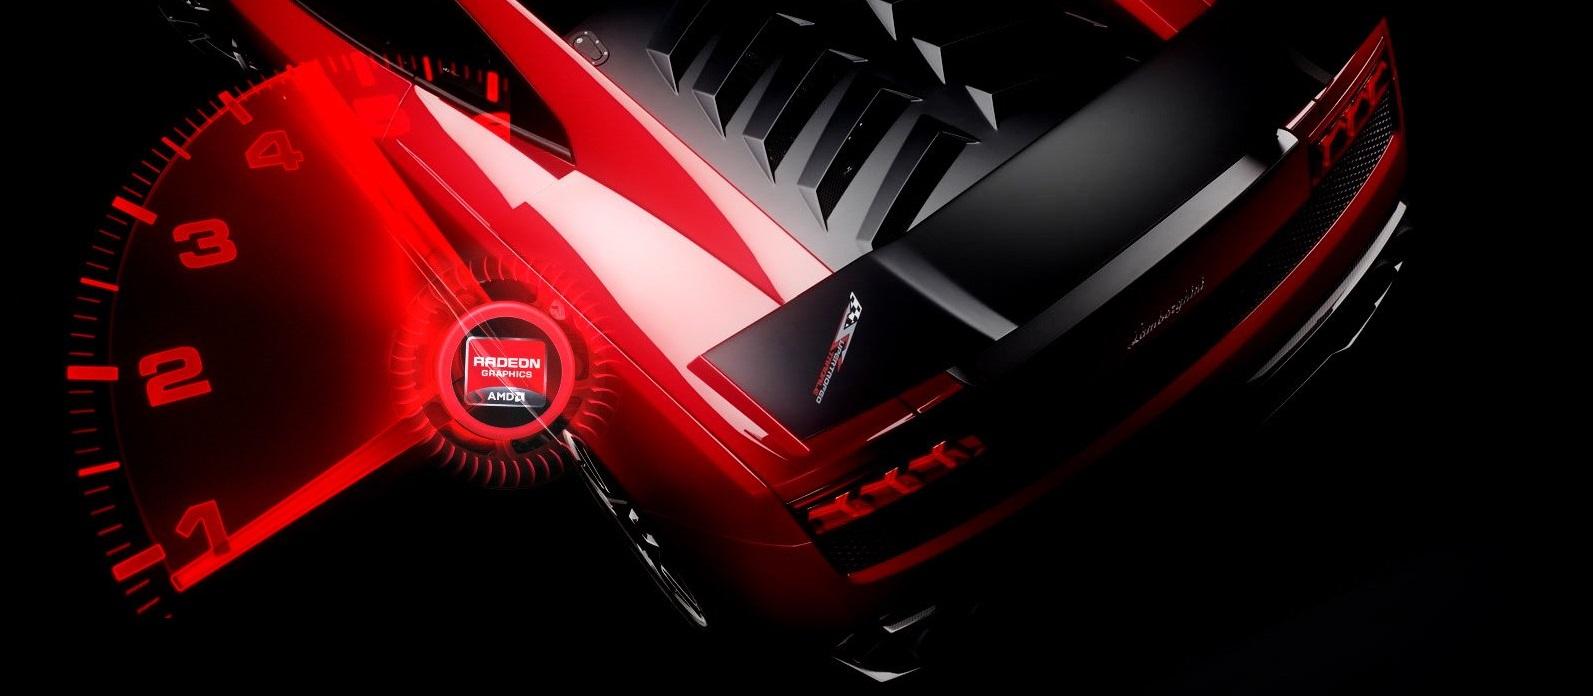 AMD Radeon Pro Software